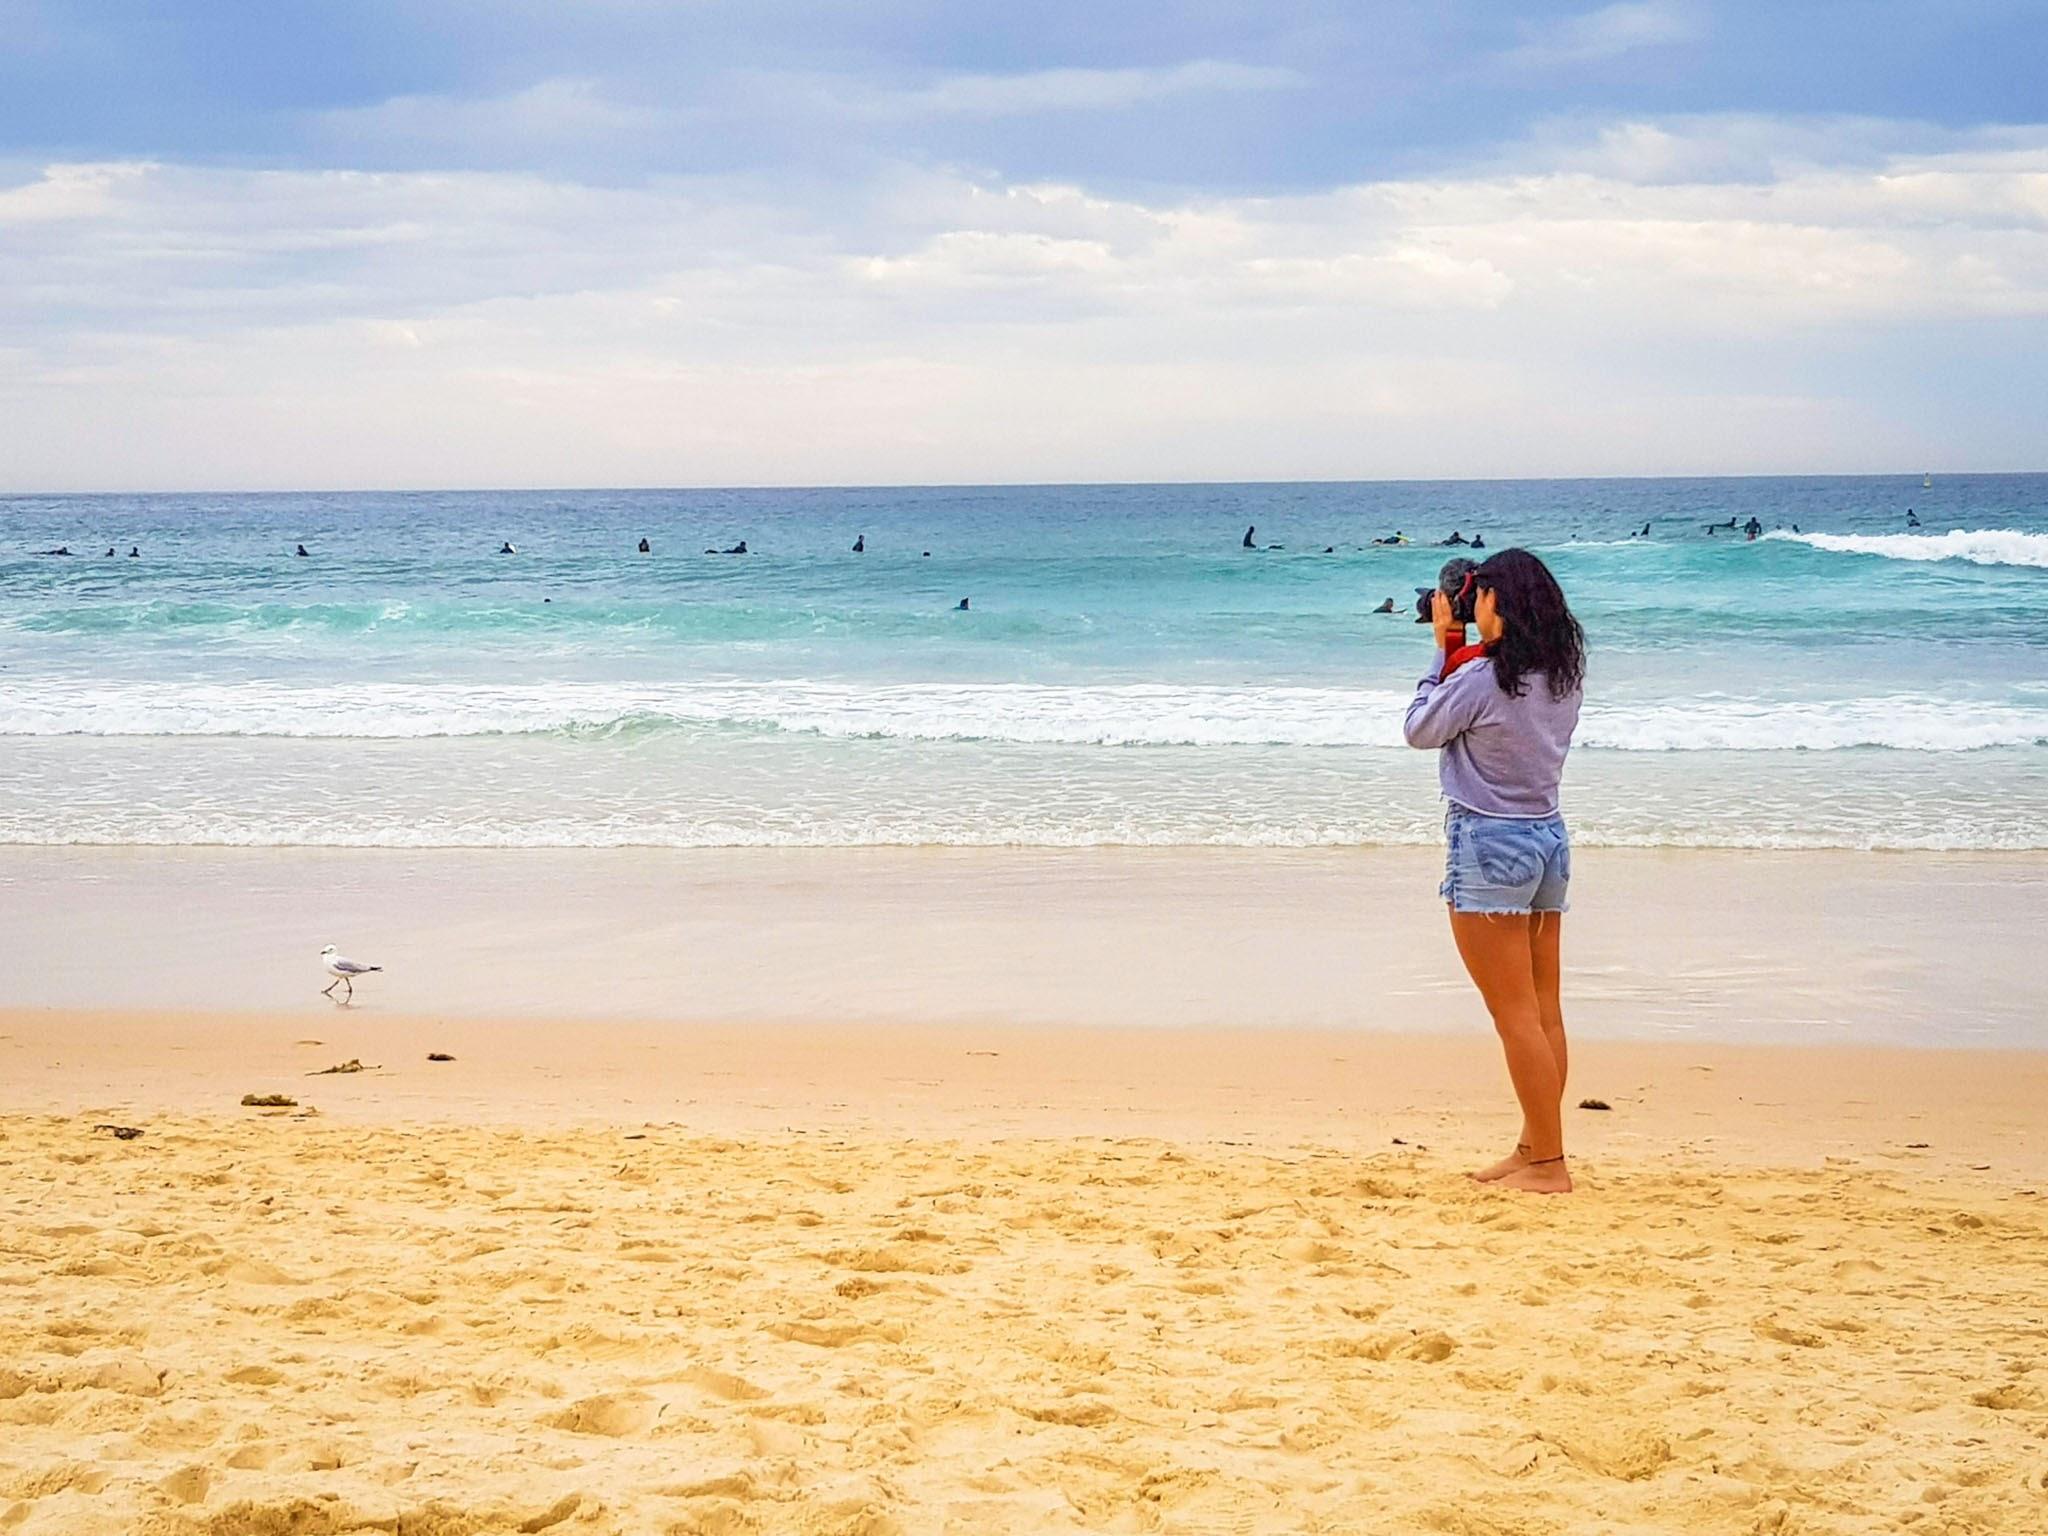 Filming some surfers.  Bondi Beach, Sydney